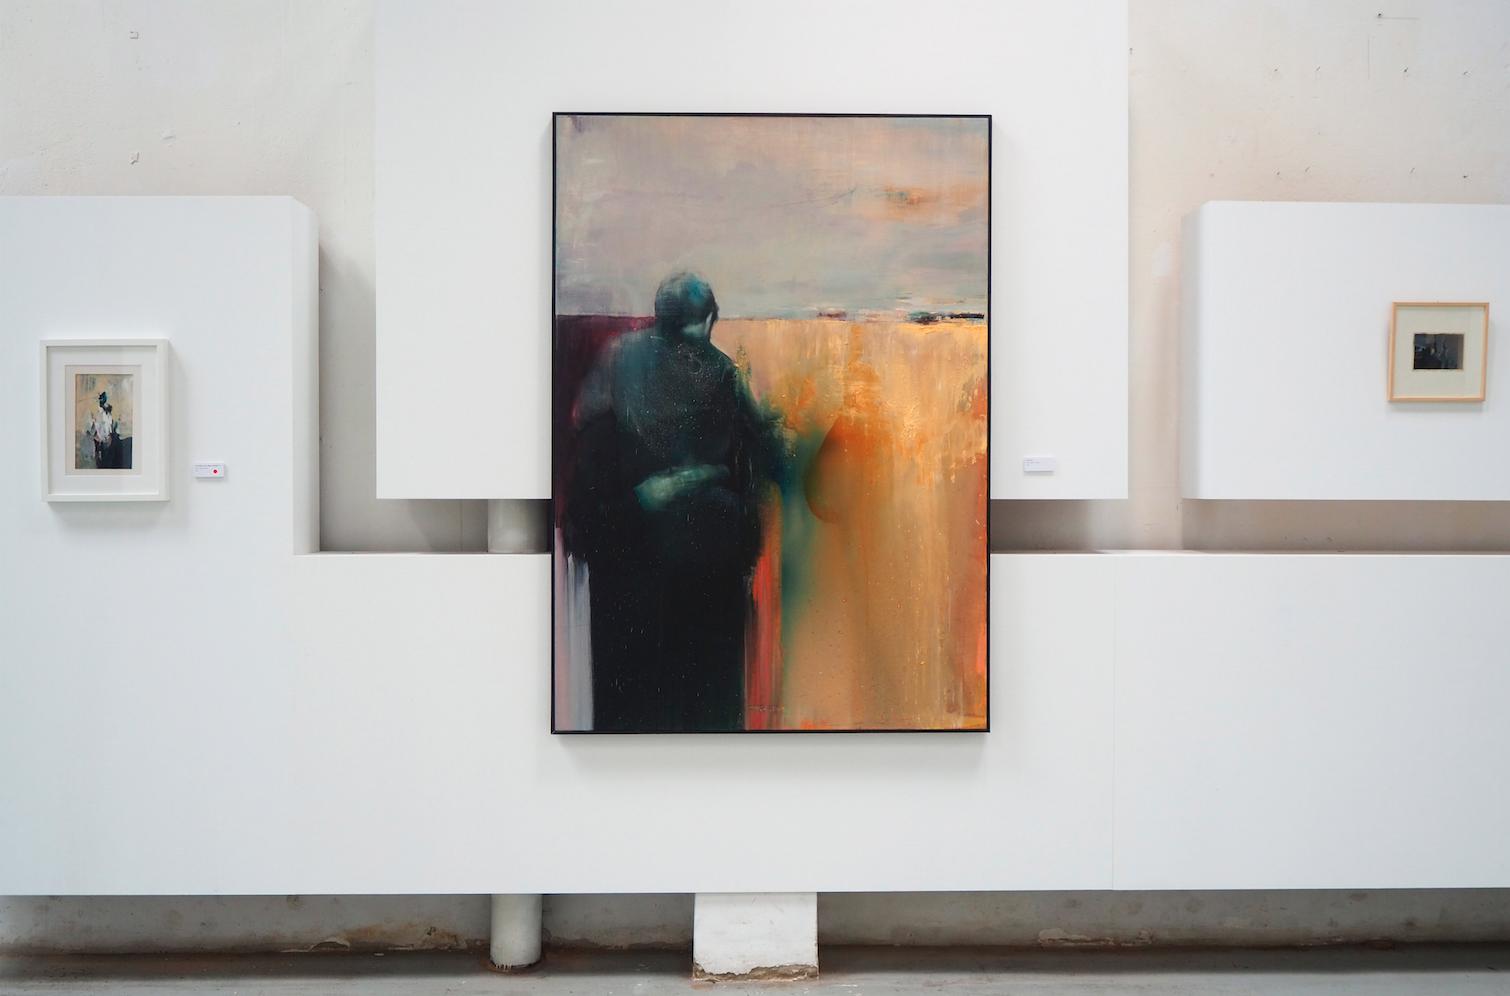 Carlos Herraiz, The Hug, 2018